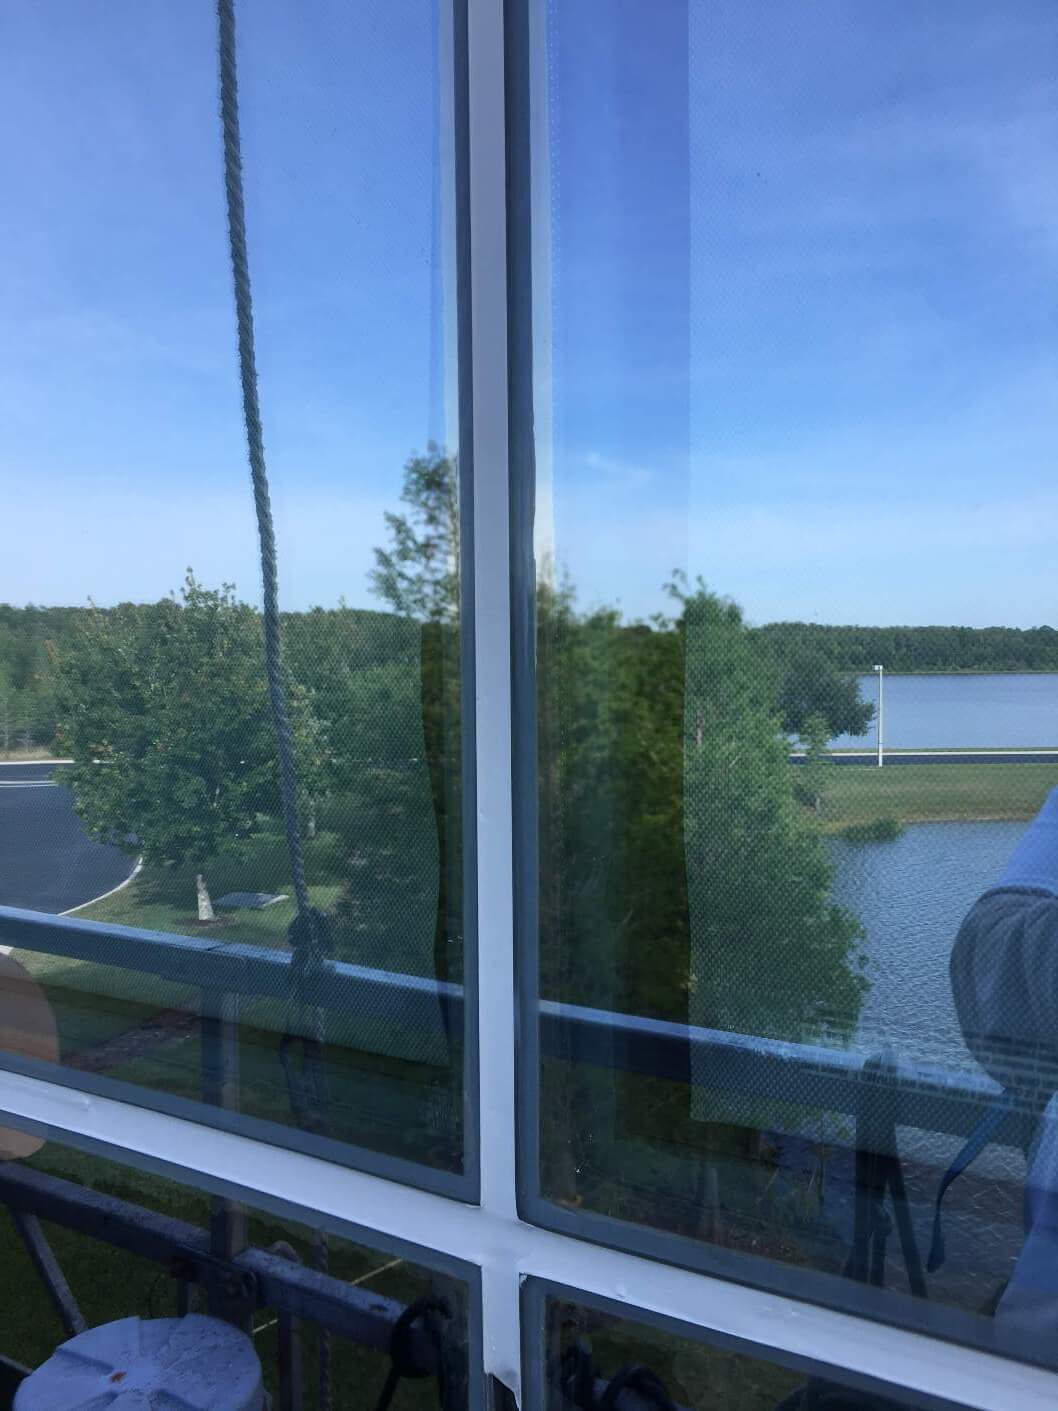 Darden-HQ-office-building-Orlando-FL-glass-caulking-presto-restoration-waterproofing-sealants